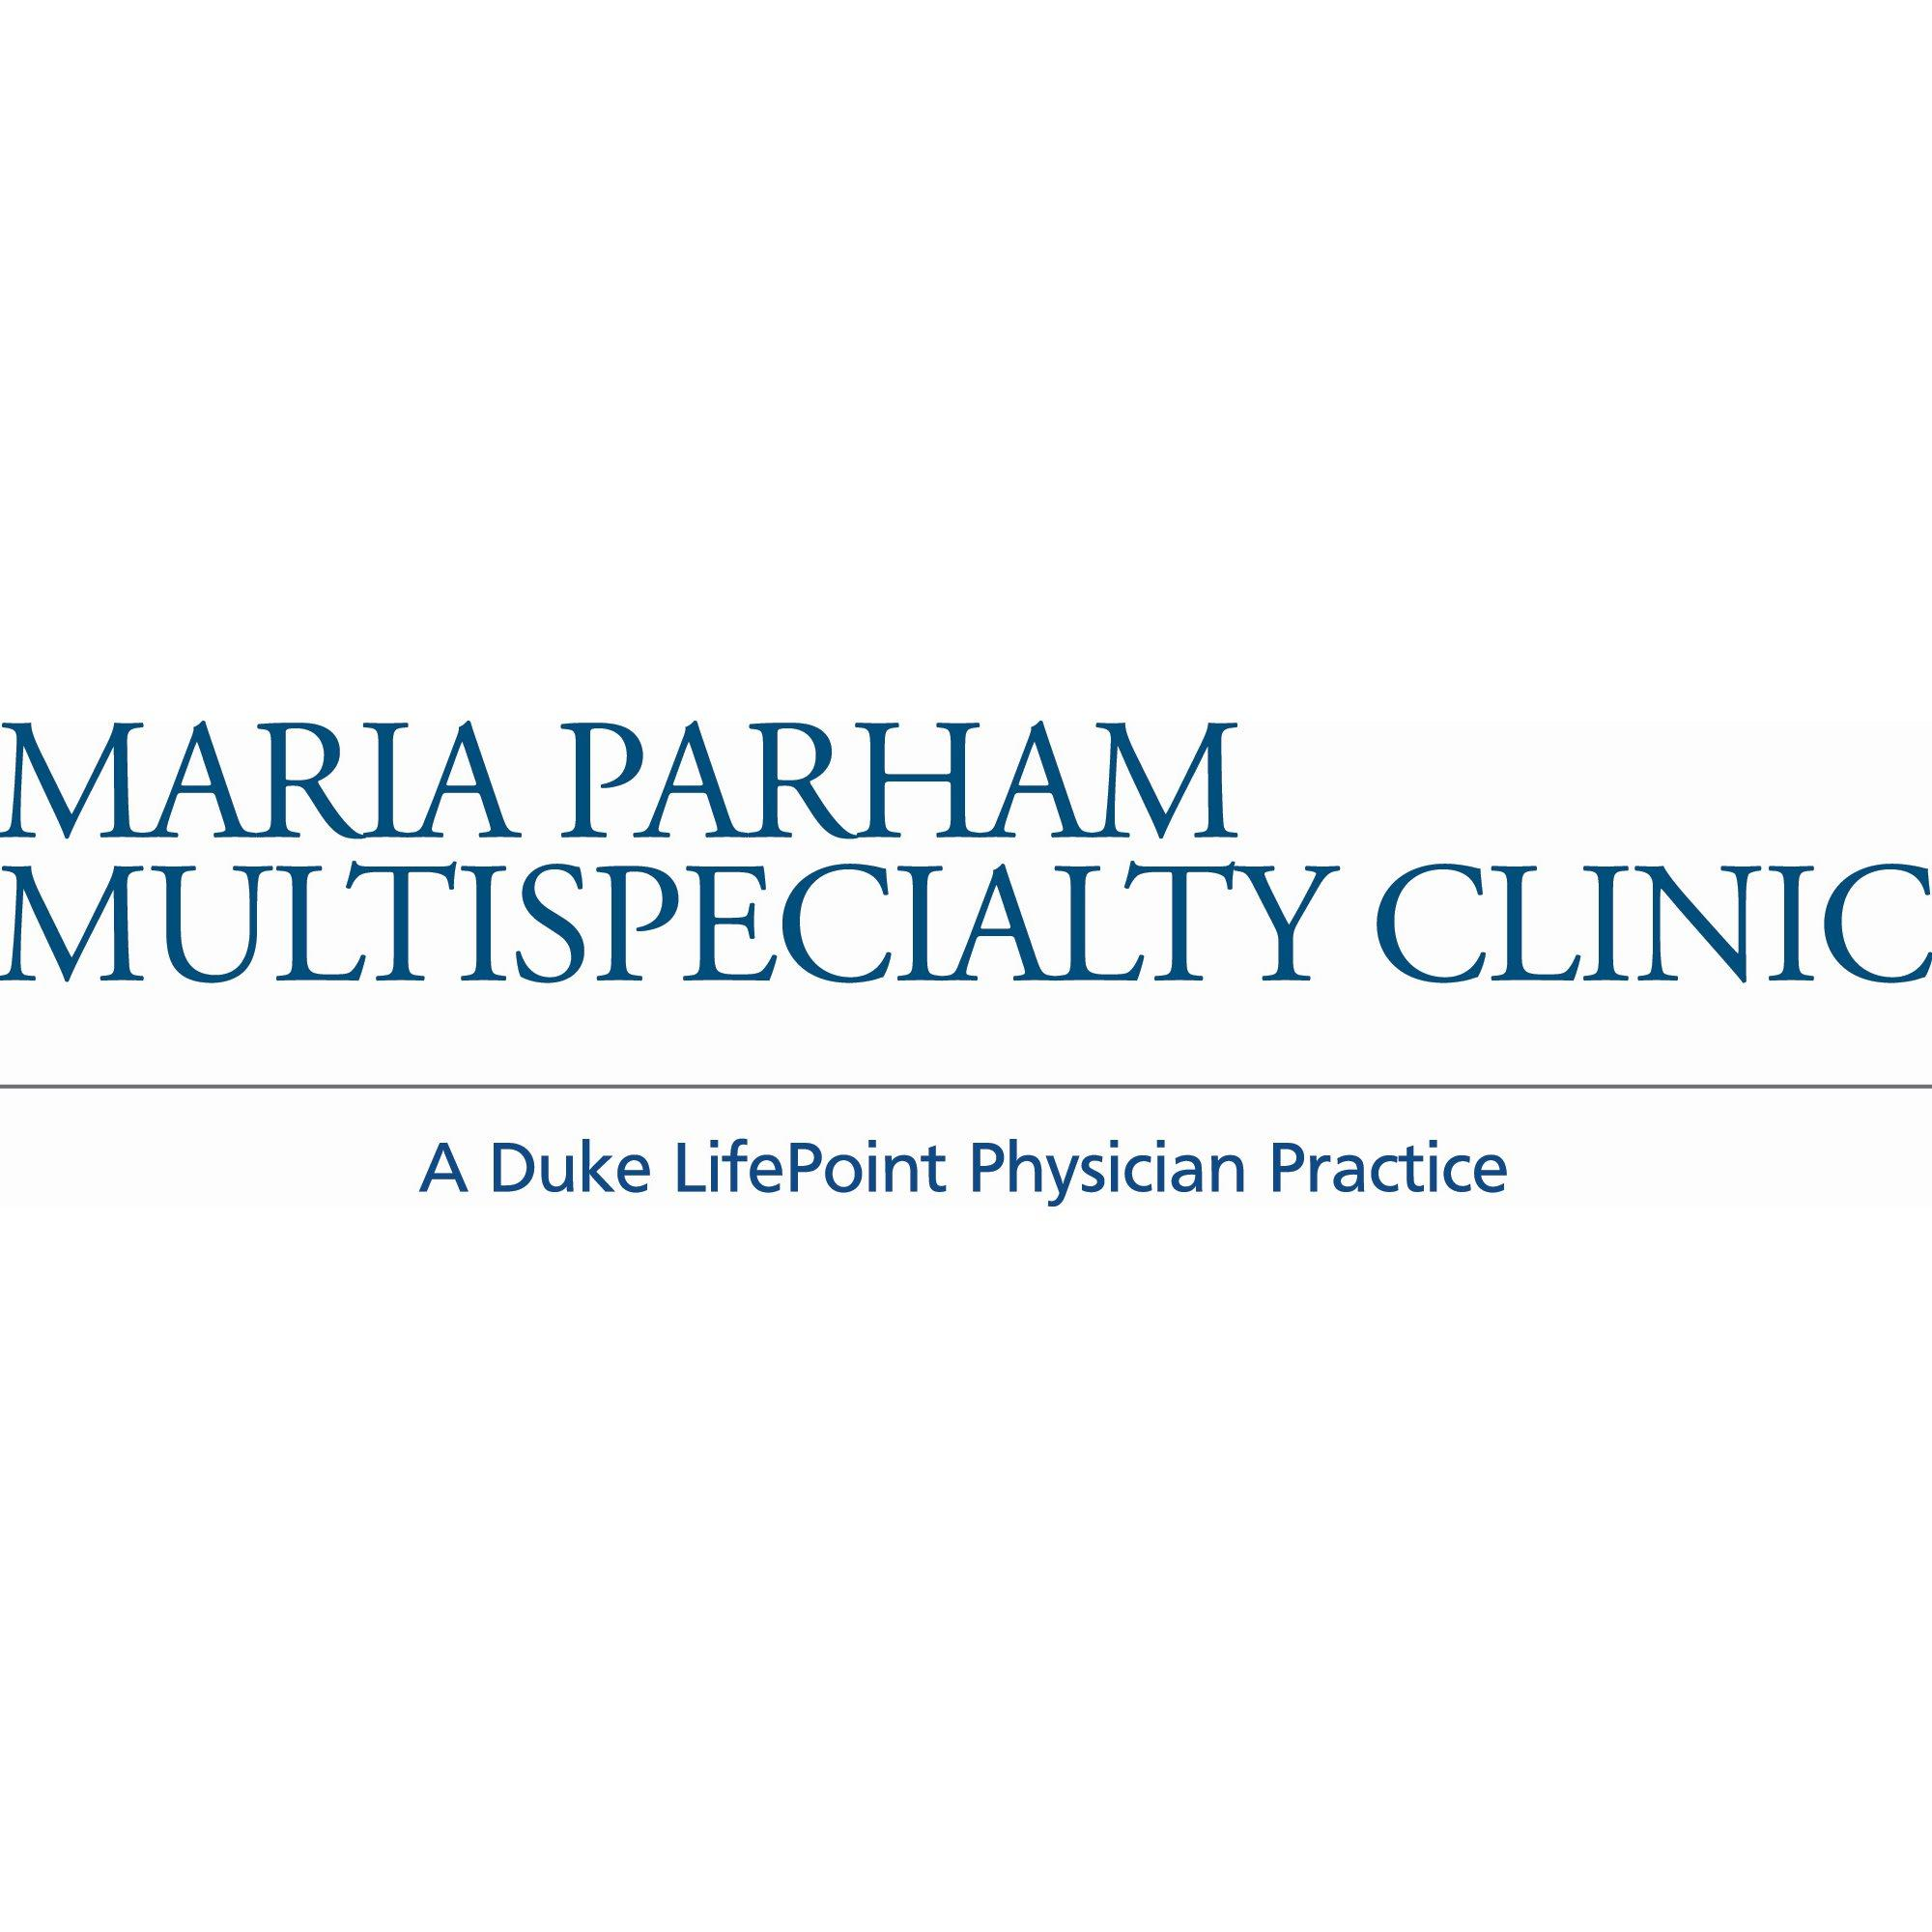 Maria Parham Multispecialty Clinic - Louisburg, NC 27549 - (919)497-8380 | ShowMeLocal.com